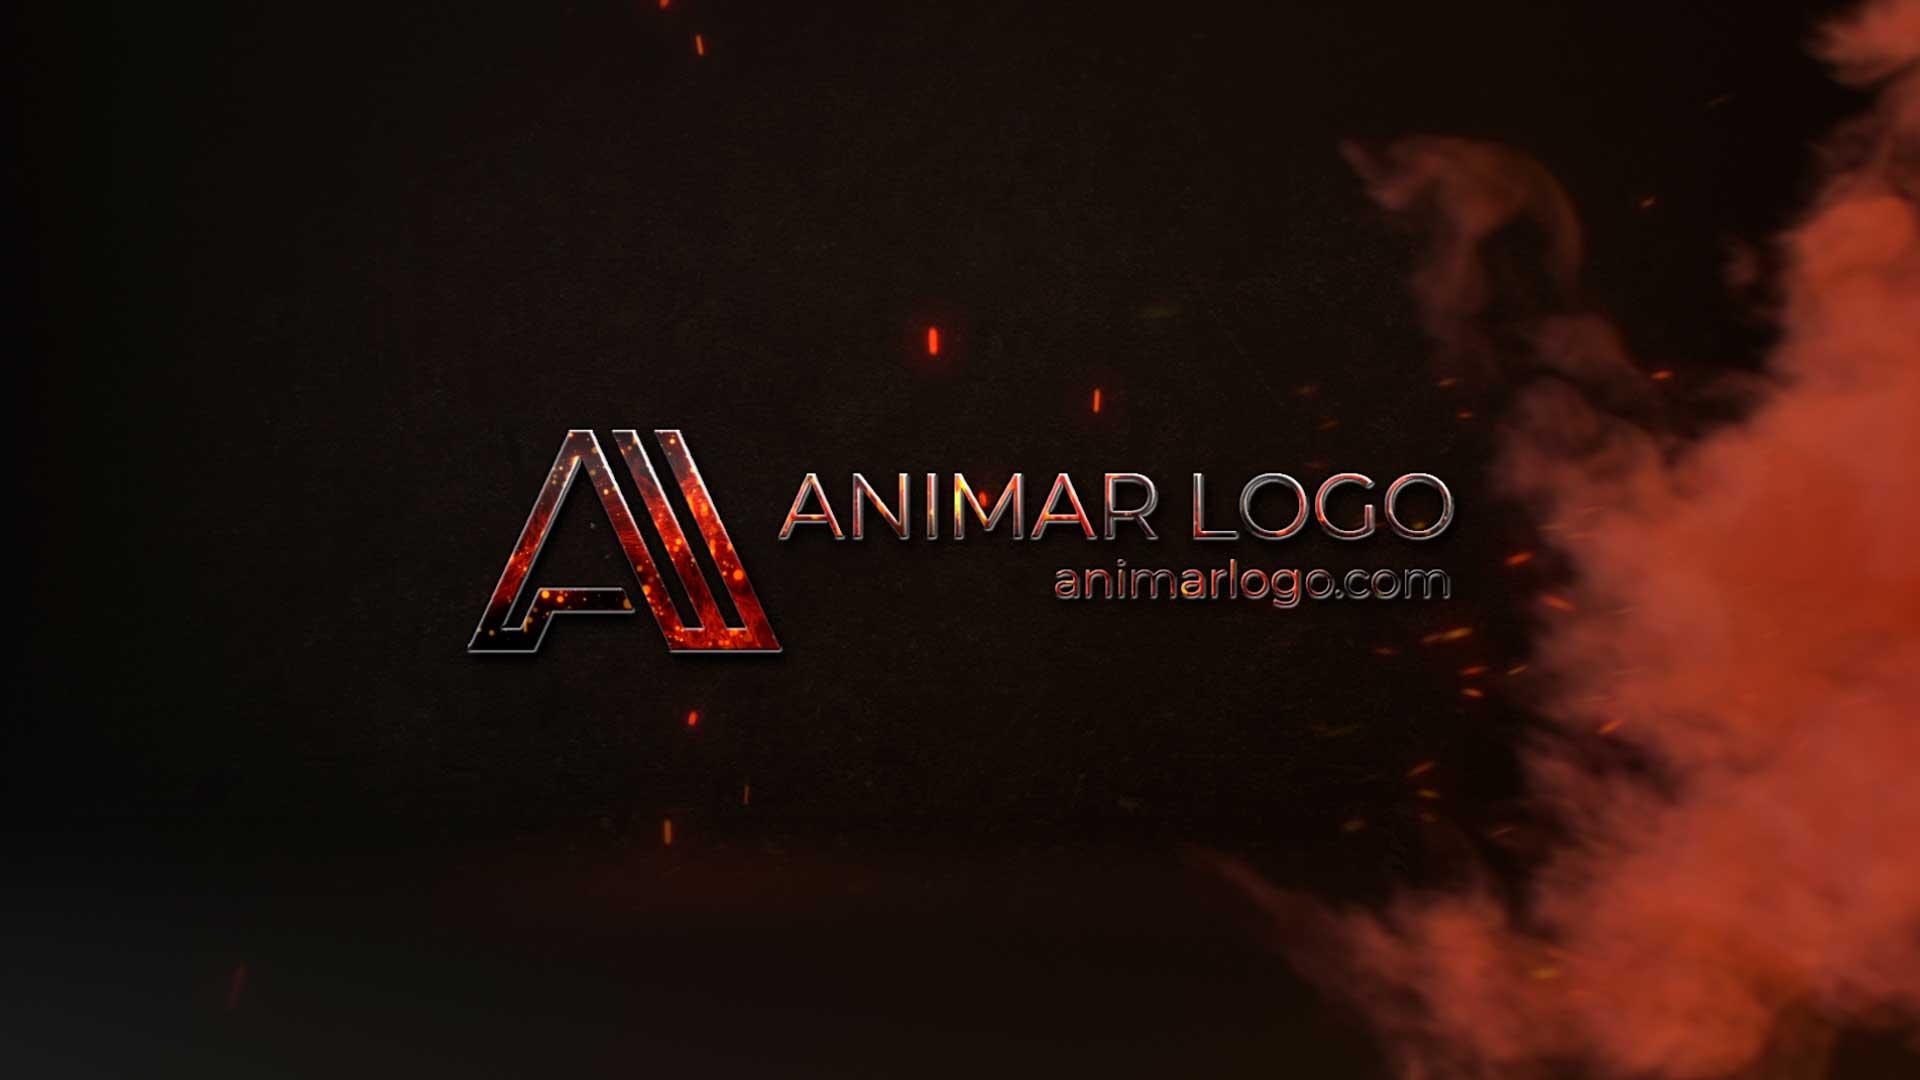 Logo-animado-Llamas-AL309-animacion-logotipo-intro para Youtube